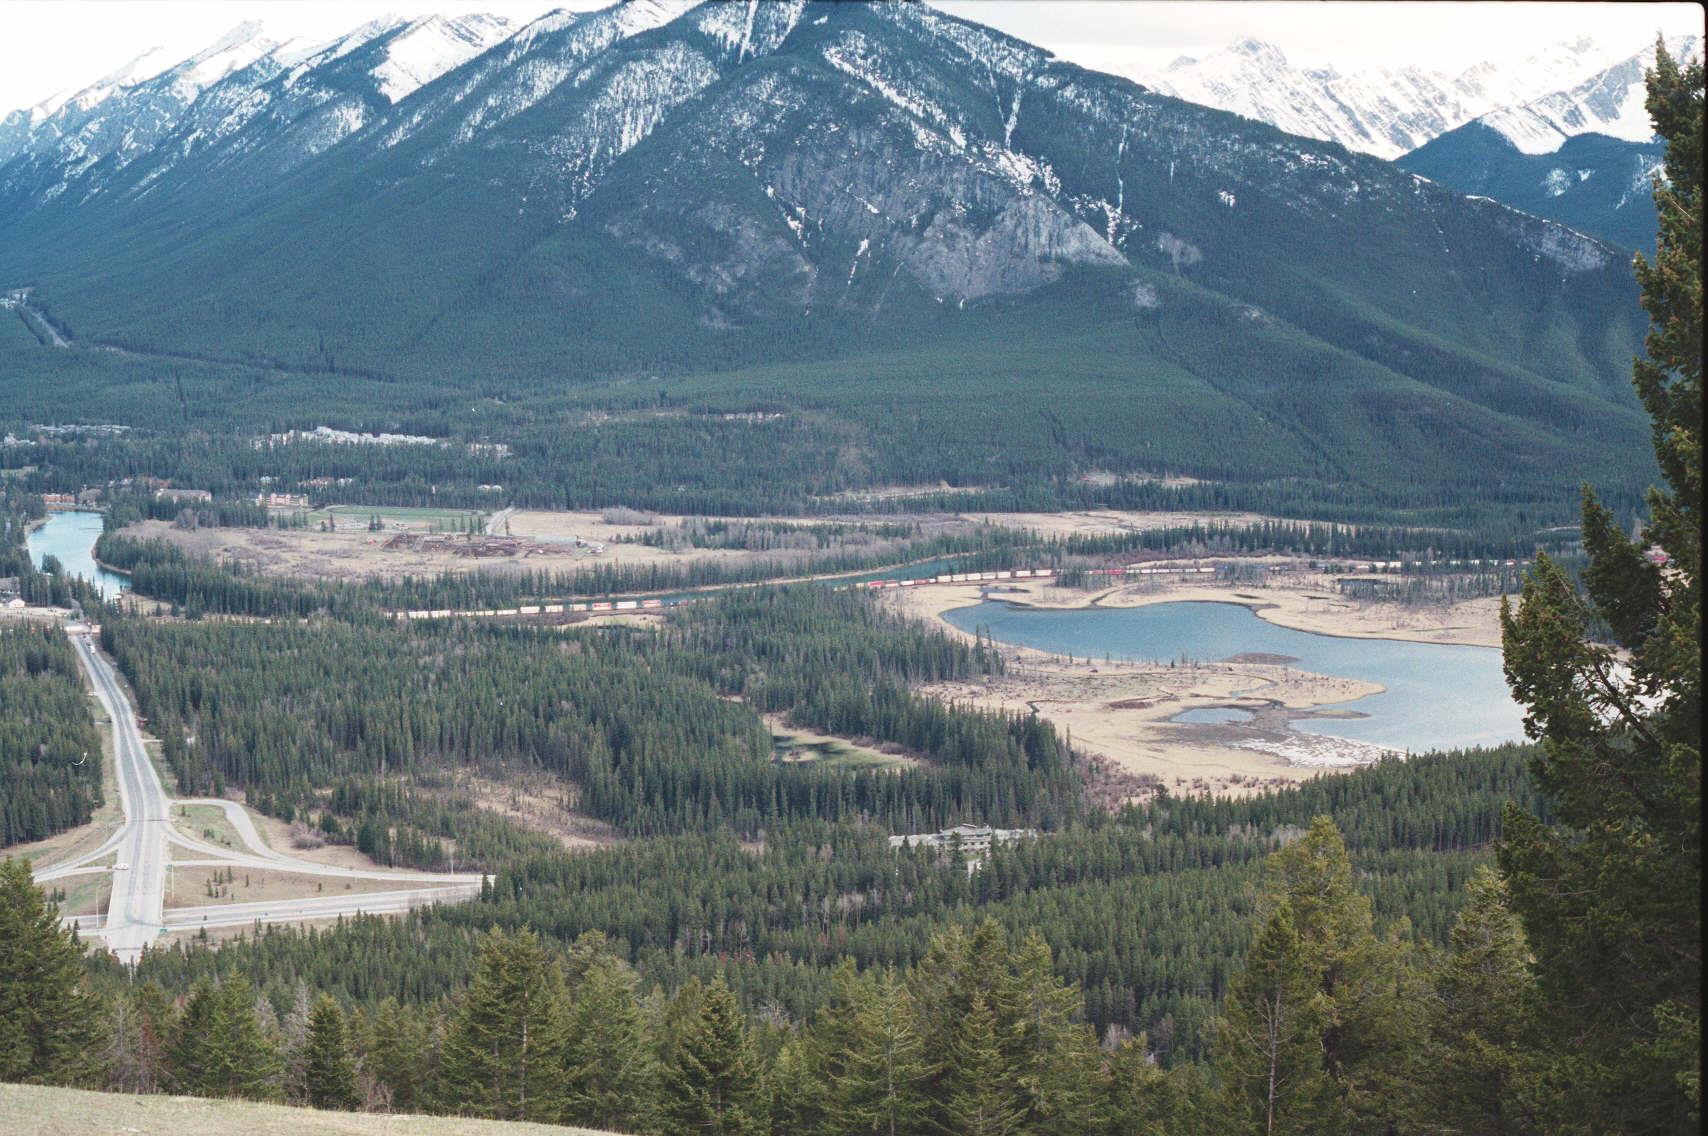 Banff Area Alberta Canada Vacation Pictures